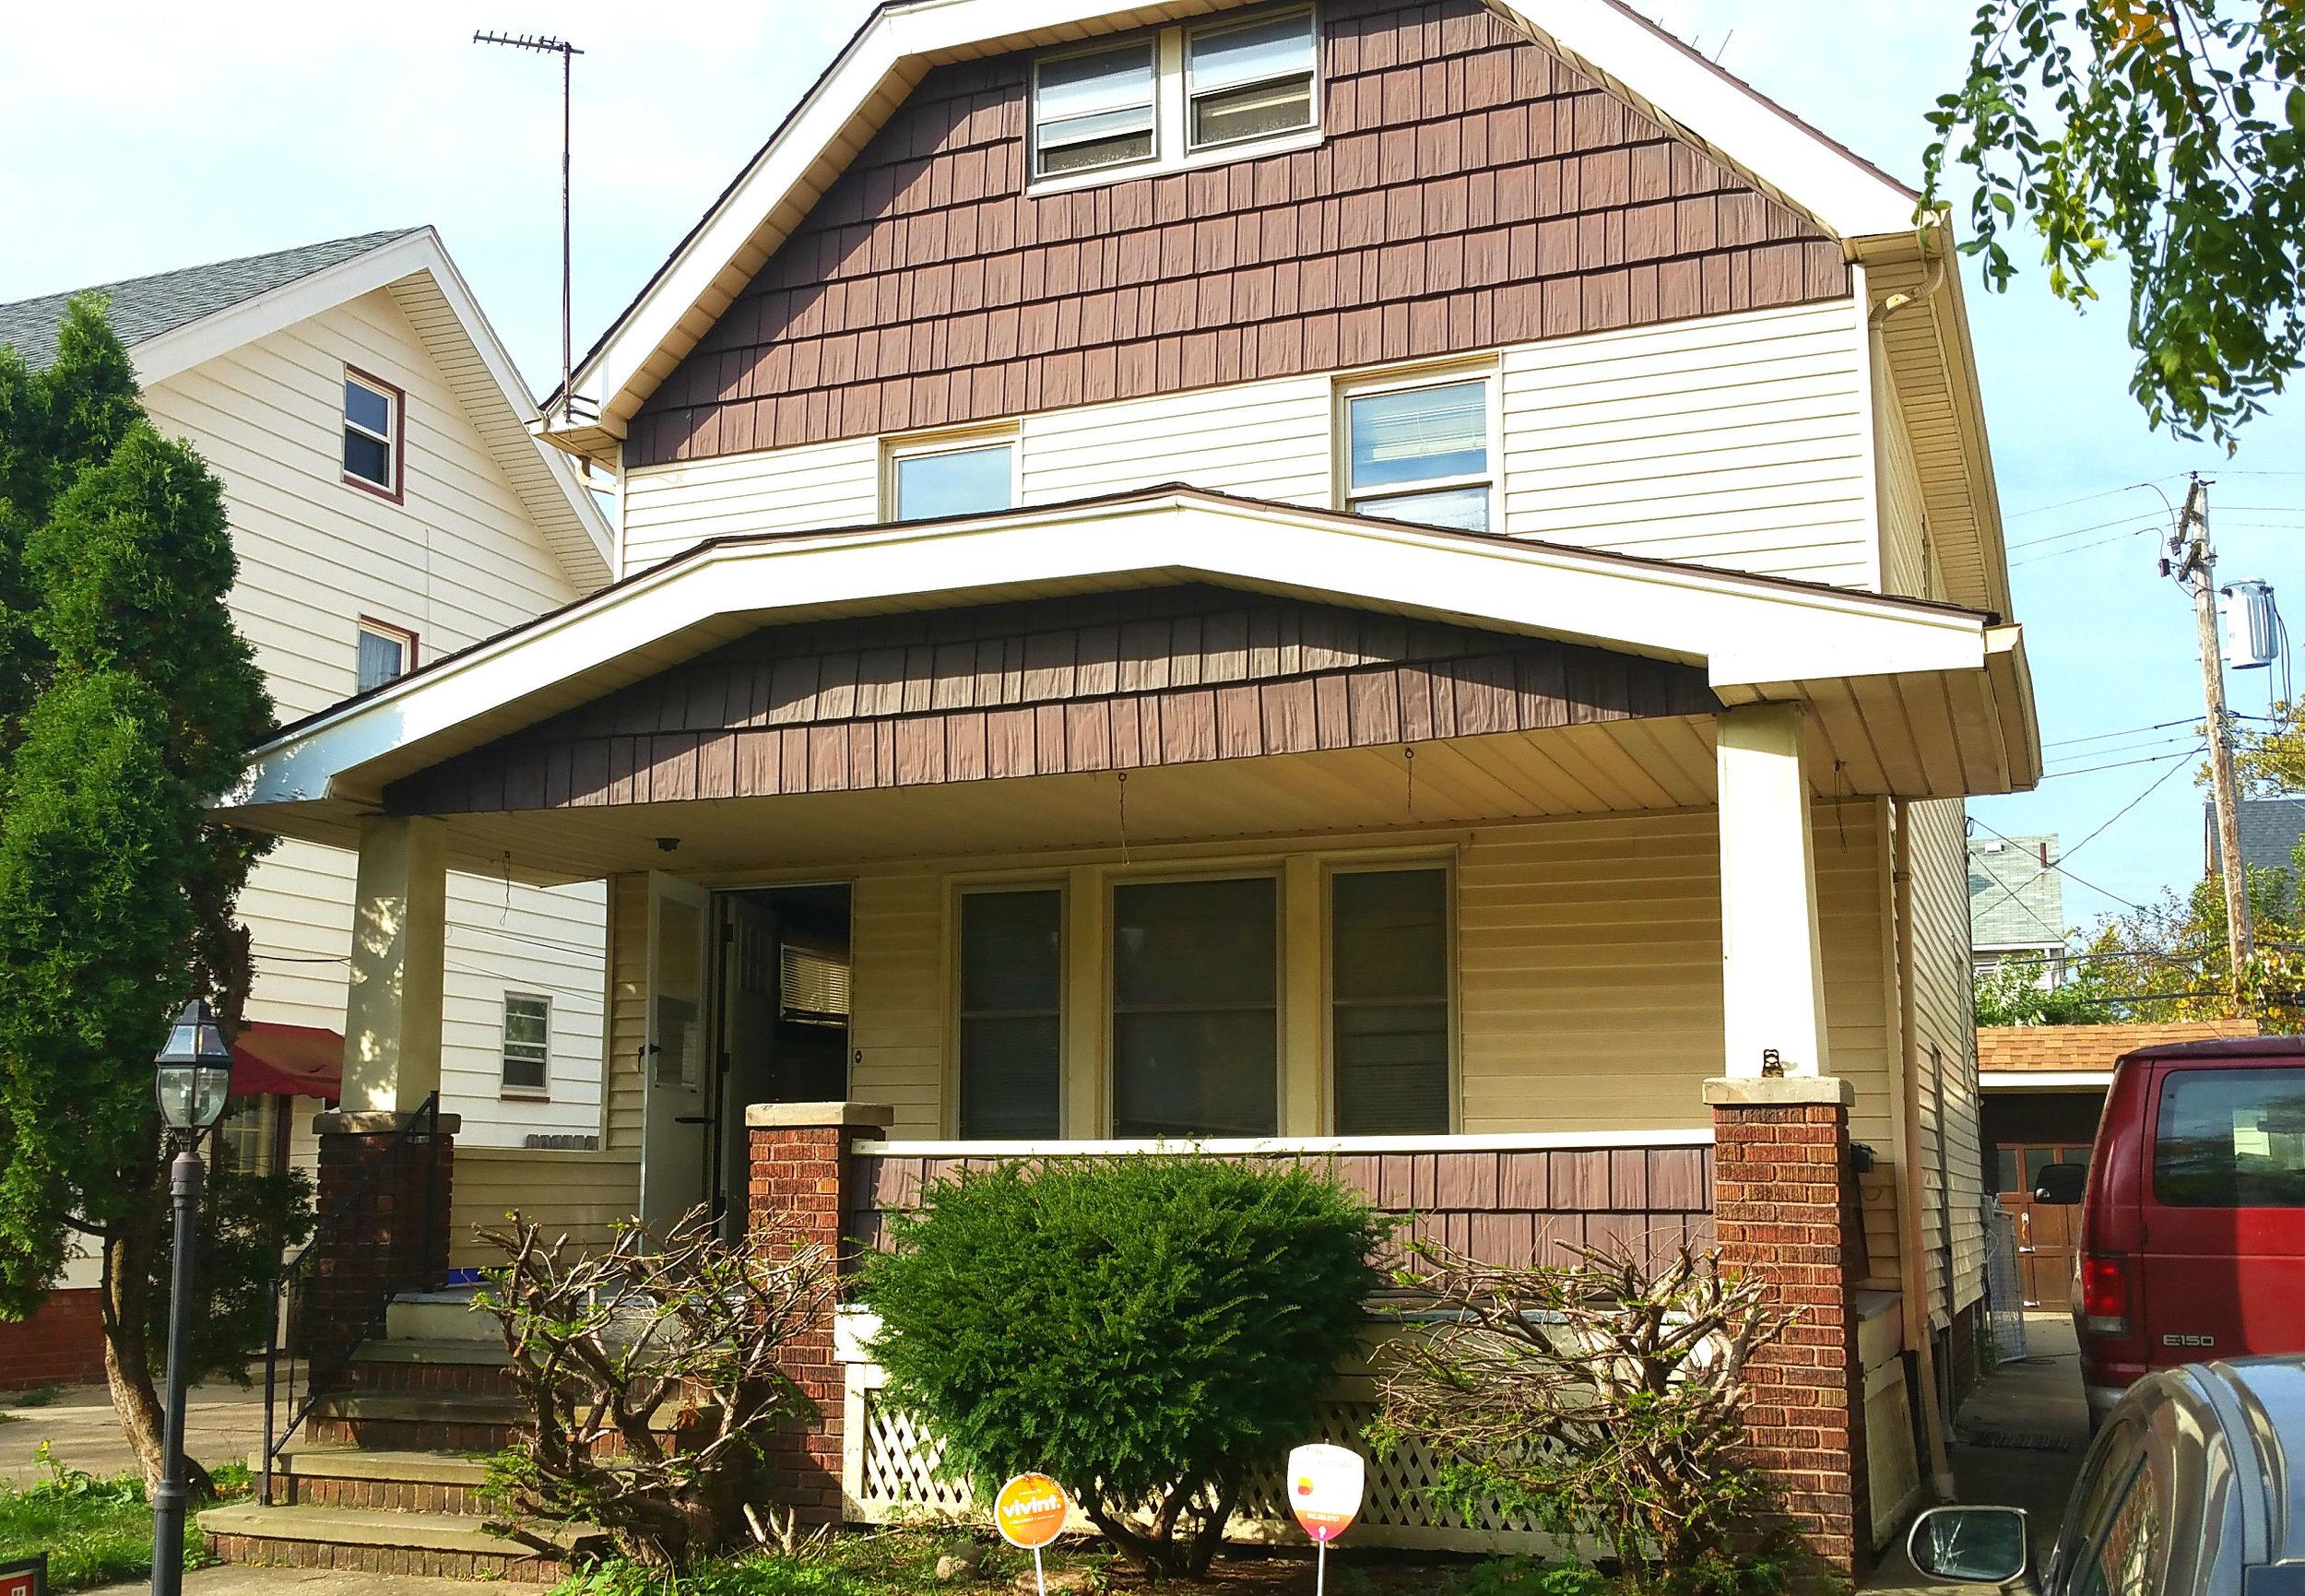 3468 W 120 St., Cleveland | 4 bed 2 bath | 1,193 Sq. Ft. | $56,000